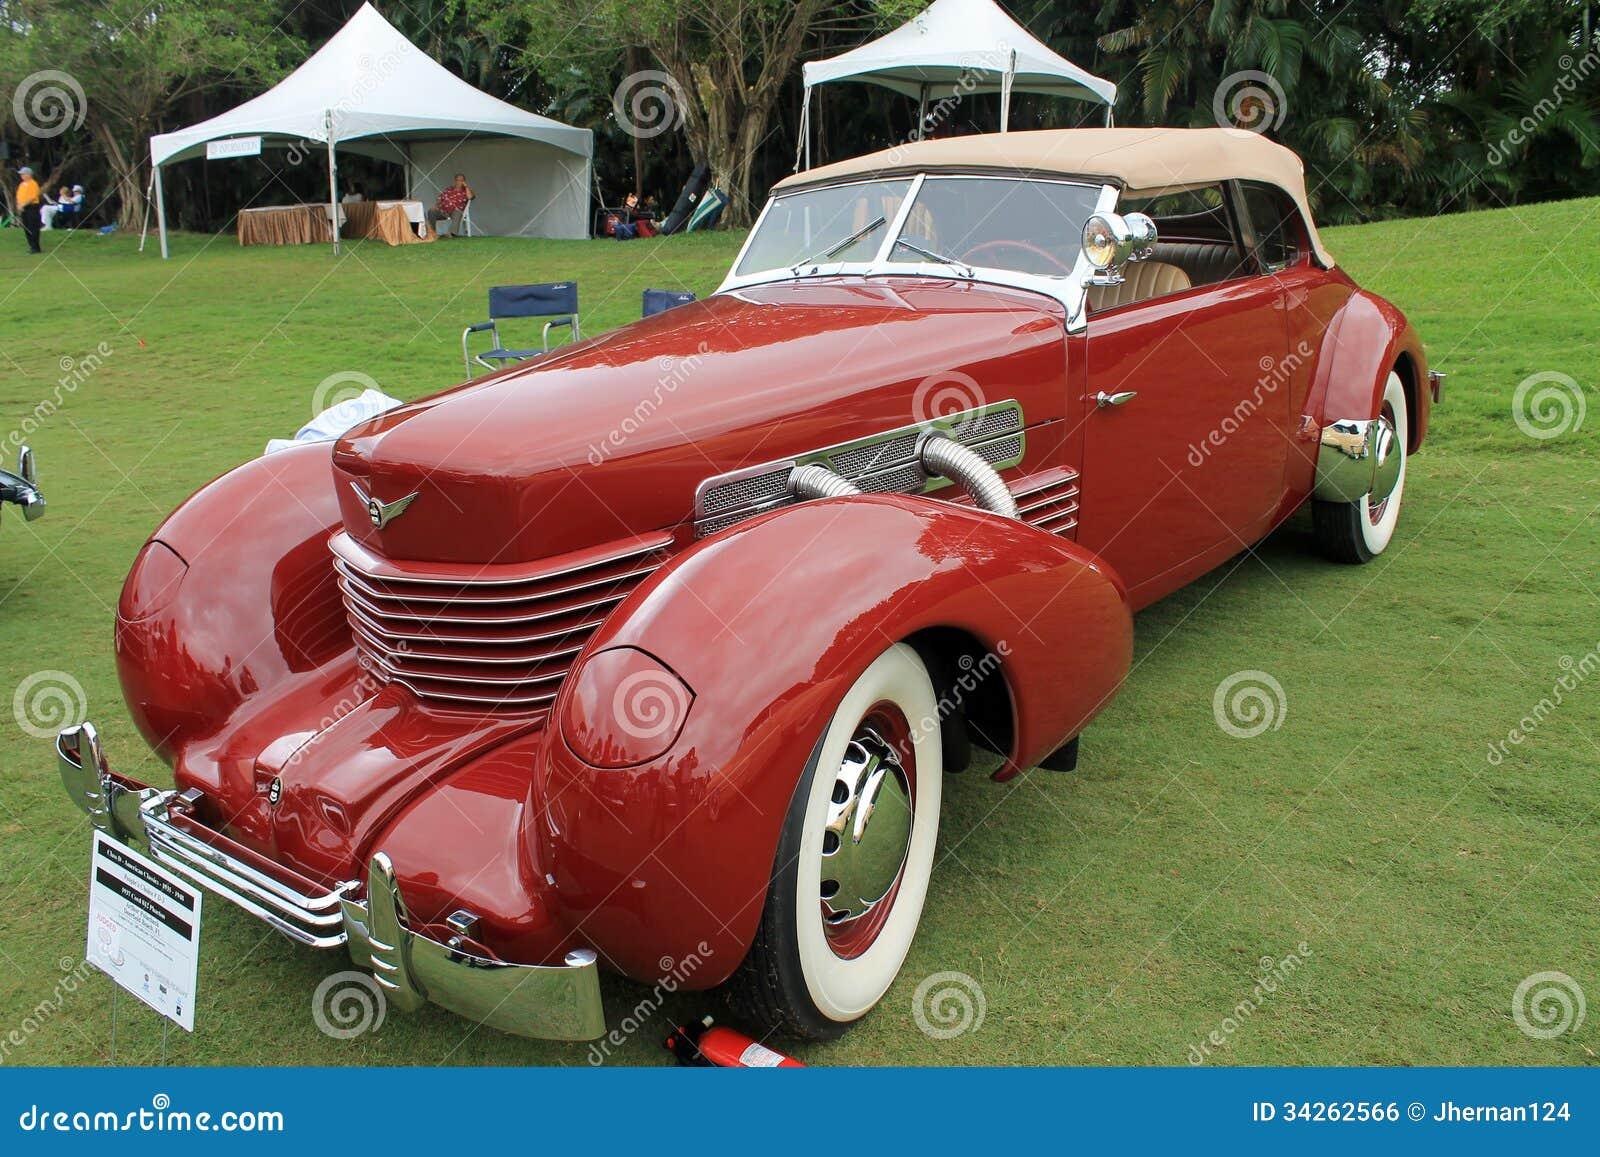 Rare classic american car editorial photo image 34262566 for Classic american